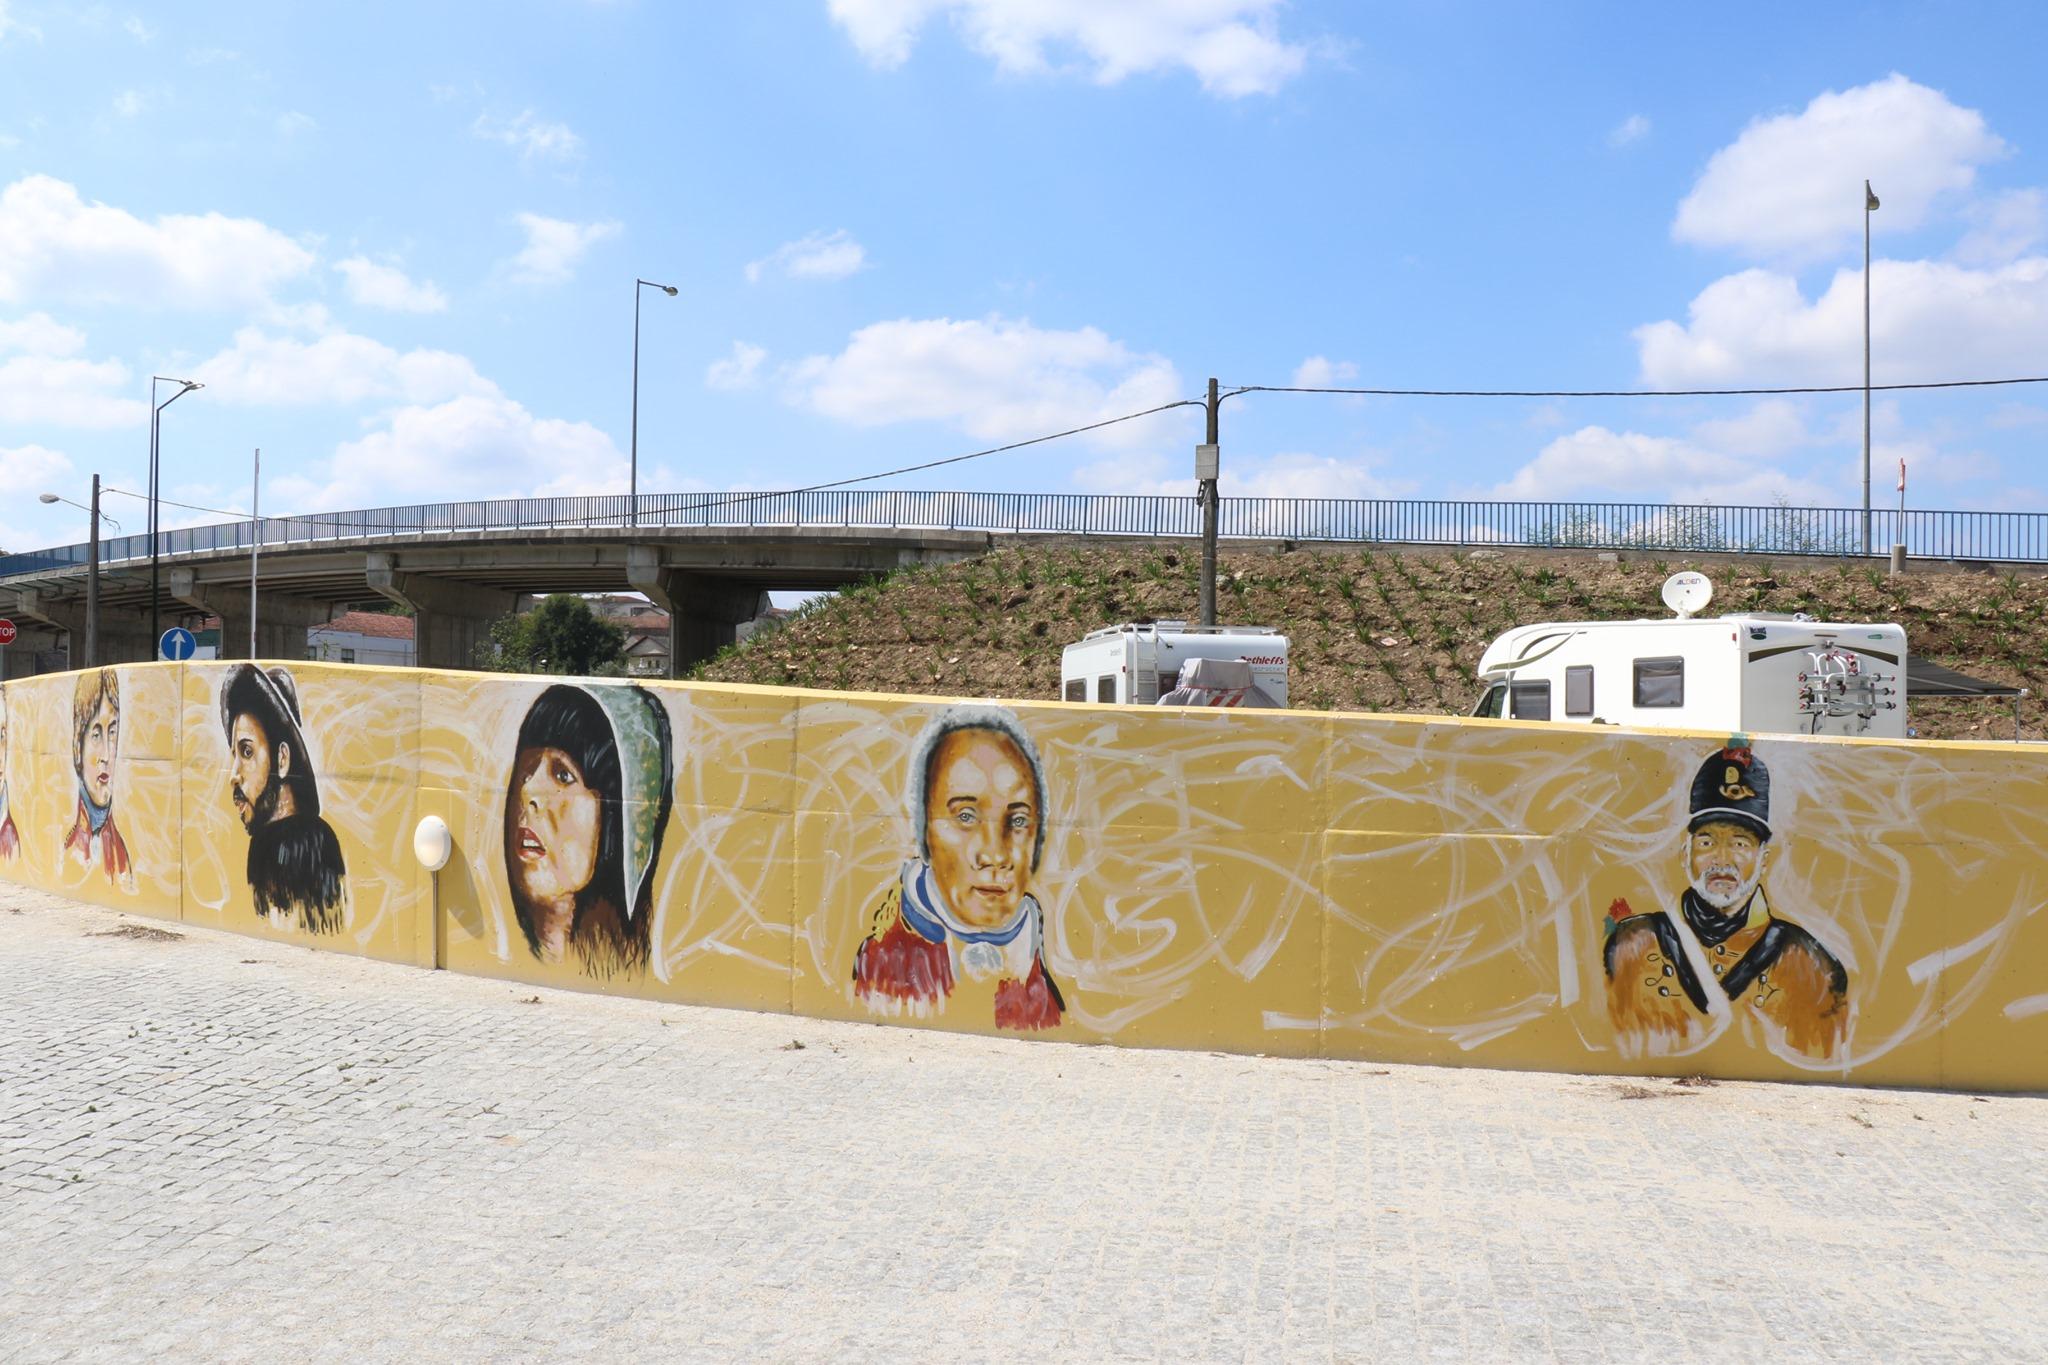 mural mortágua 08 09 2021